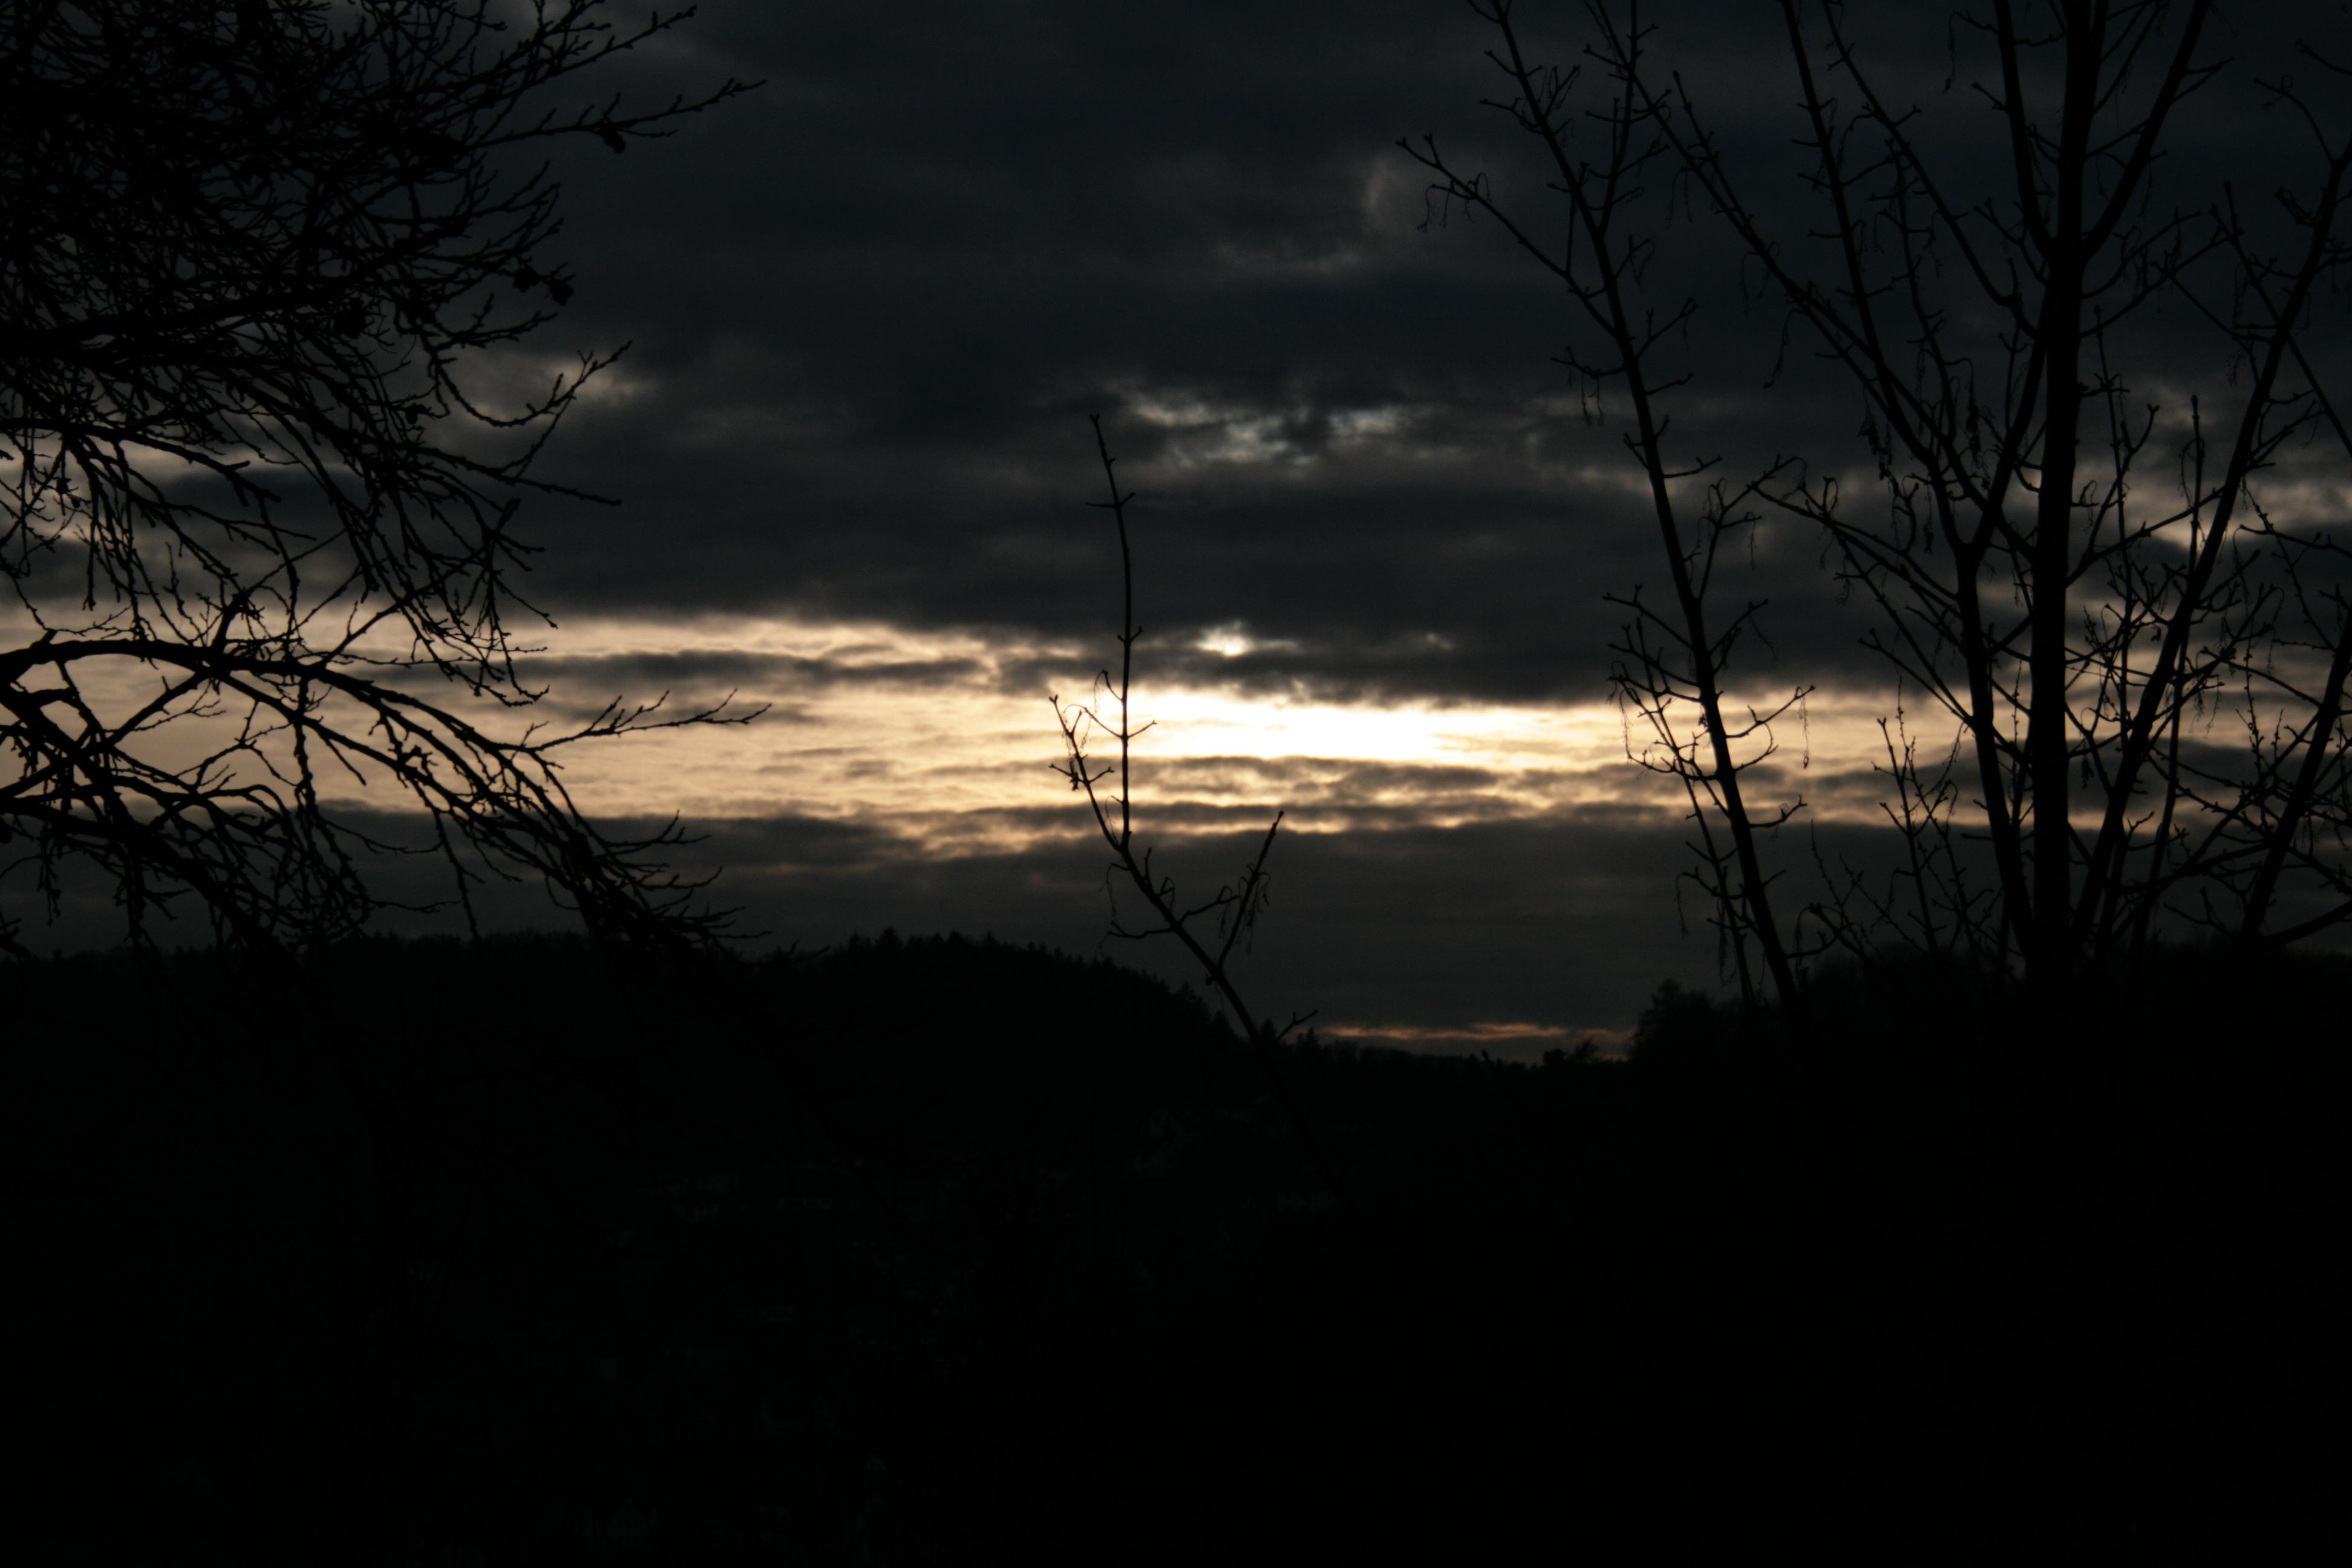 File:Dark sky.JPG - Wikimedia Commons